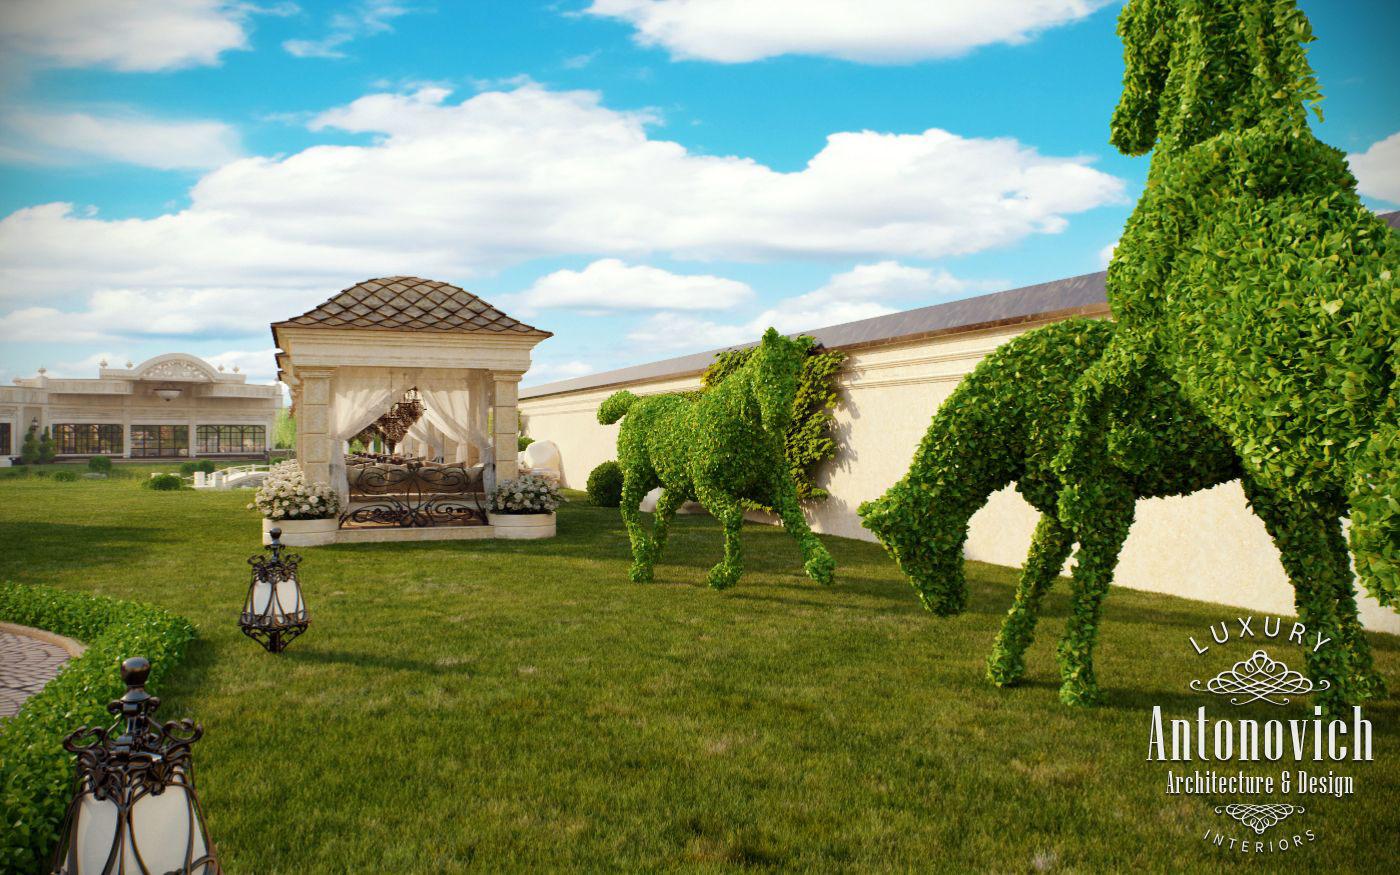 landscape design dubai from luxury antonovich design on behance